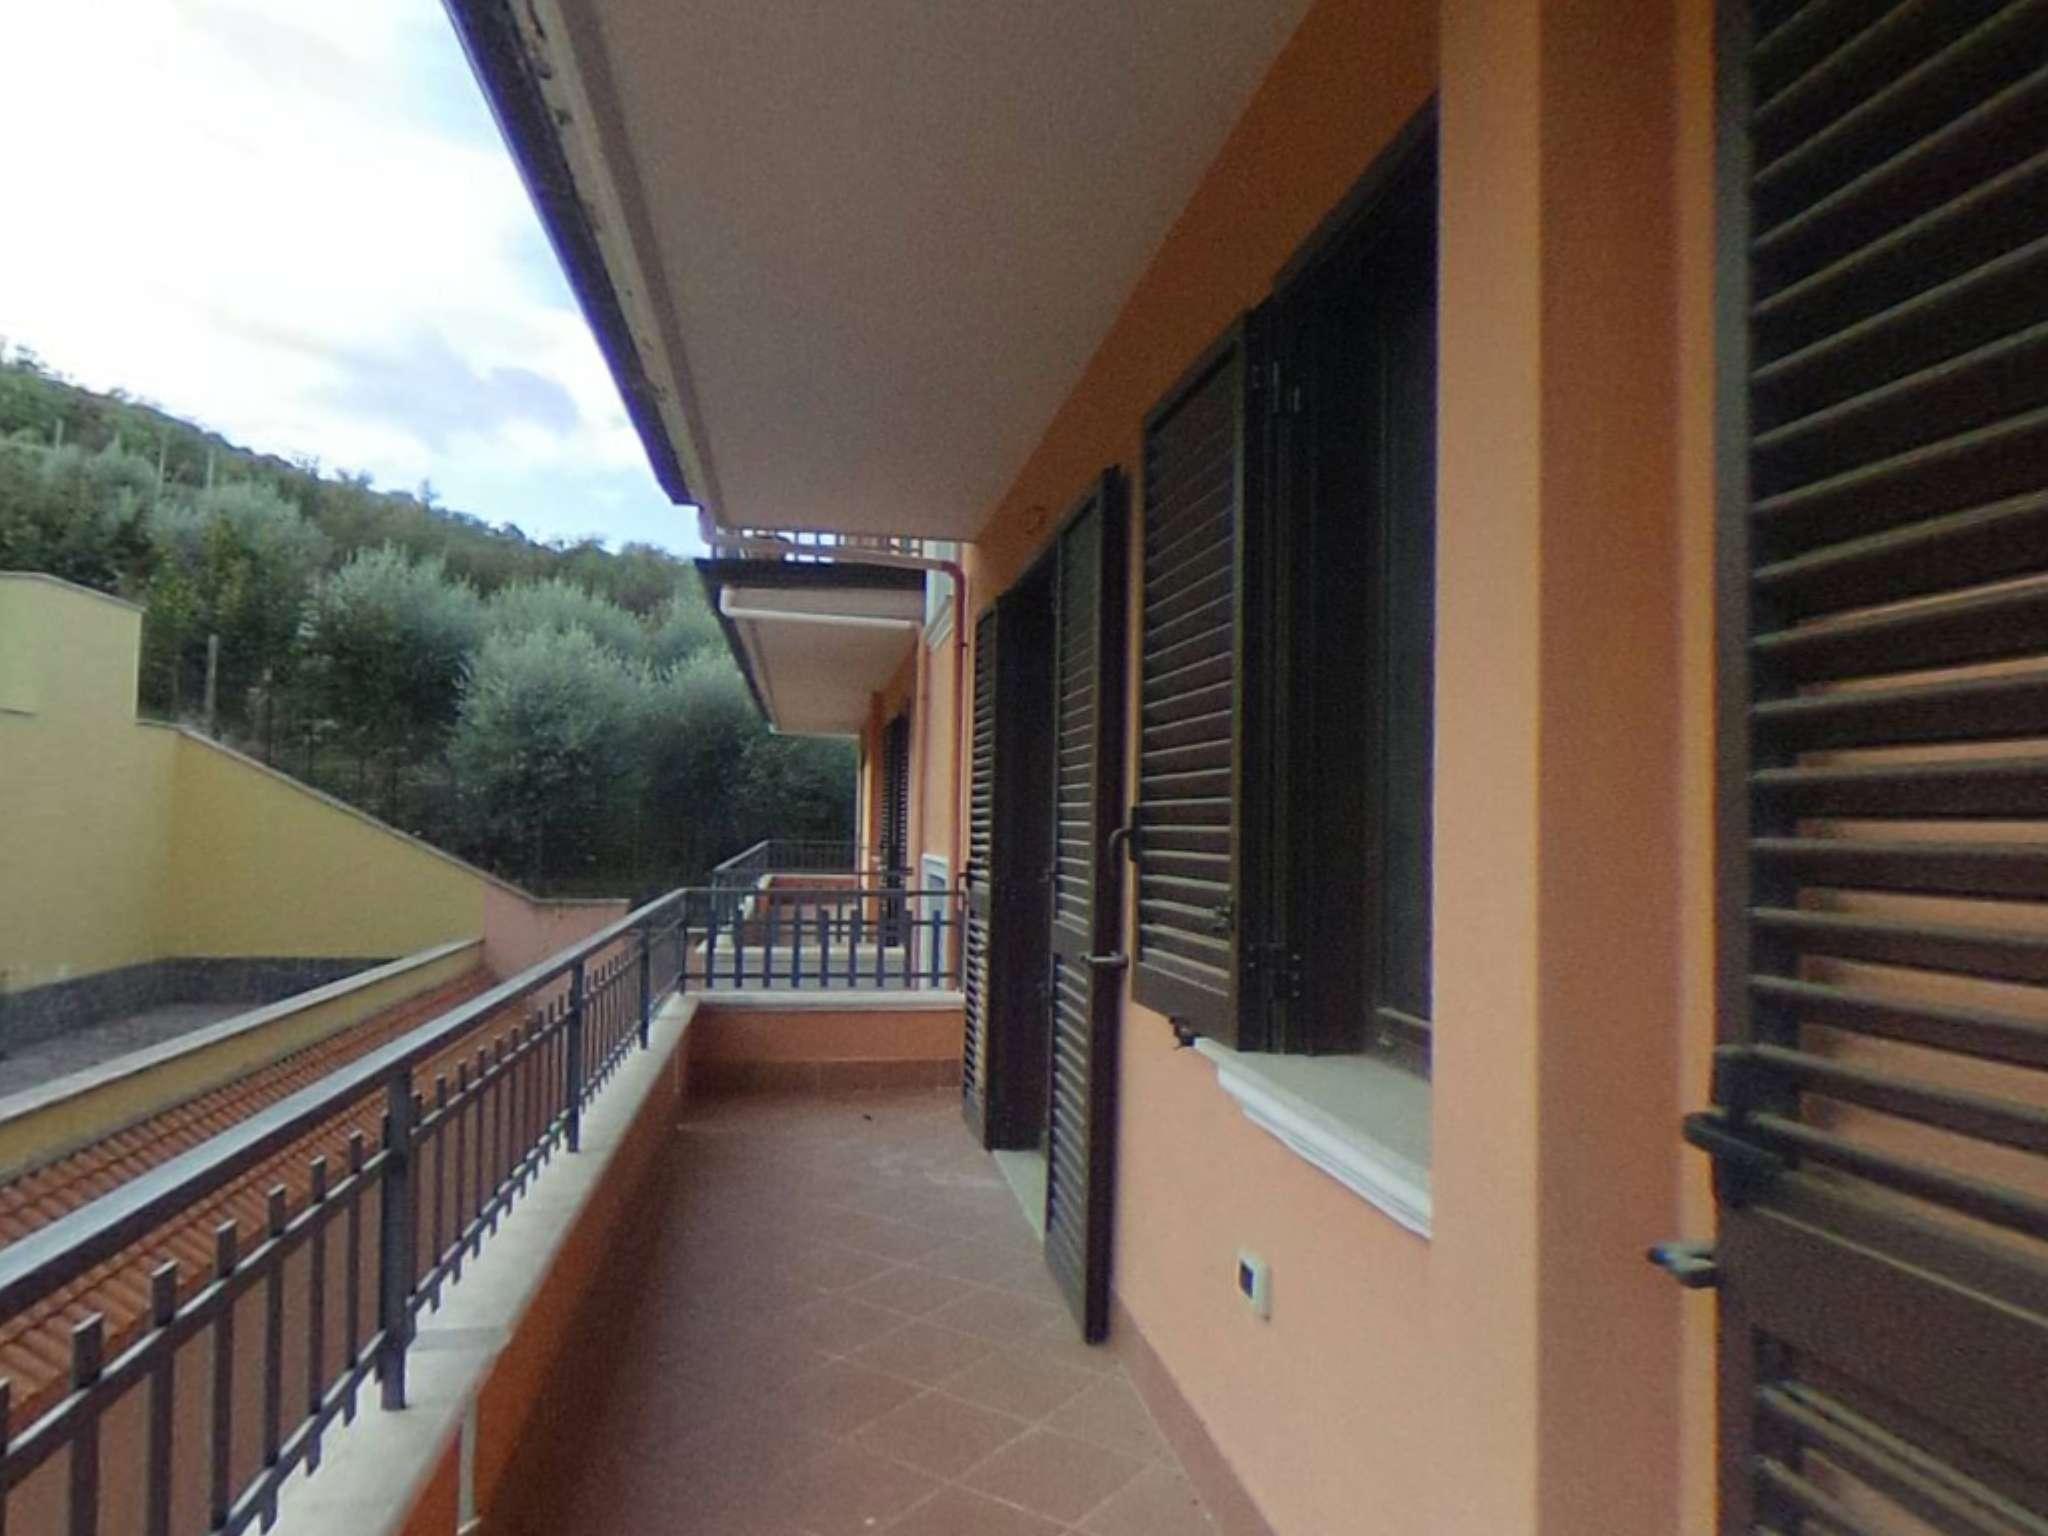 Appartamento, Carlo Santorelli, 0, Vendita - Carbonara Di Nola